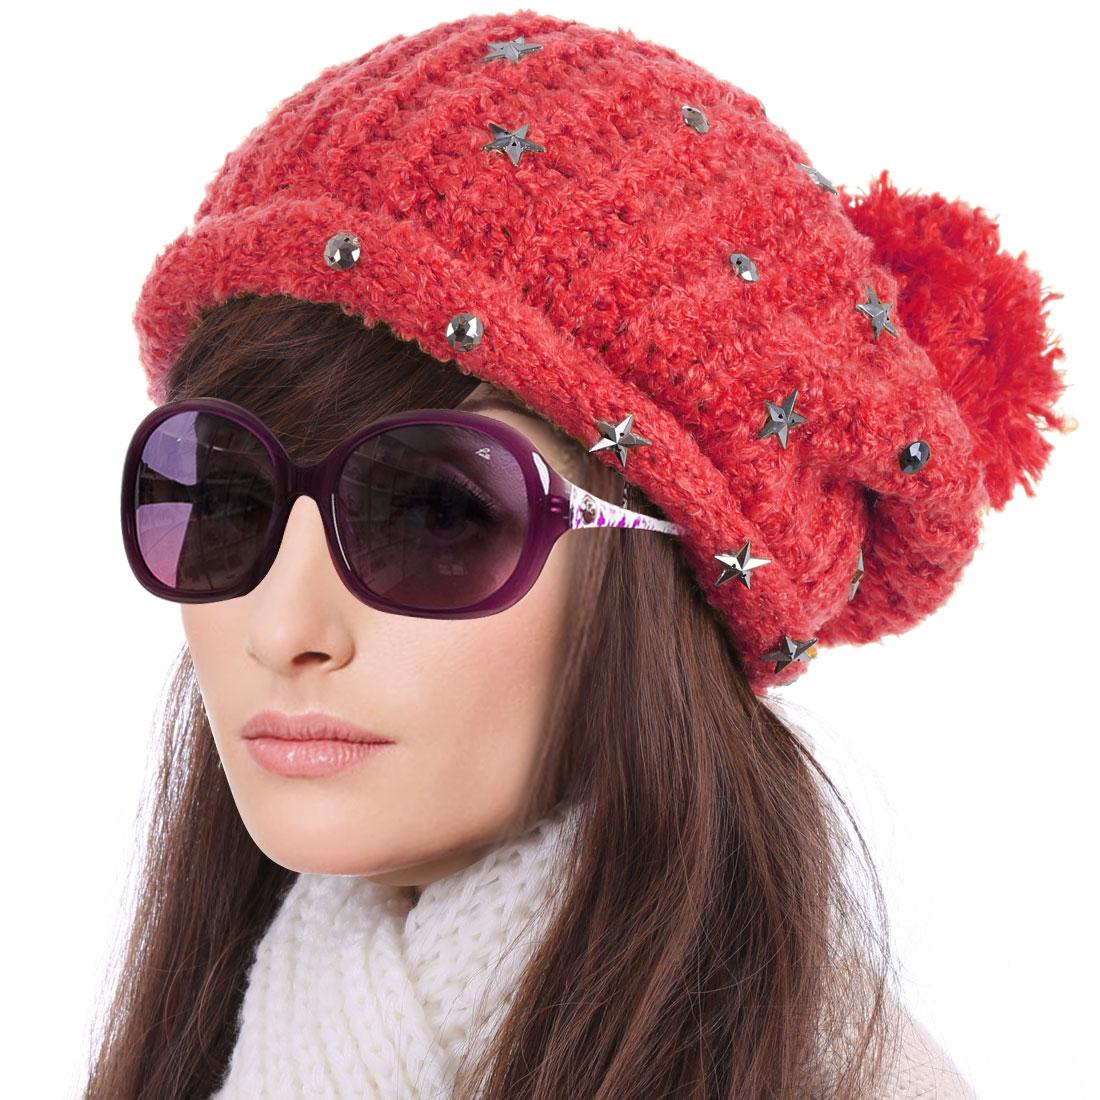 Women's Lovely Pom Pom Stars Decor Warm Winter Red Knitted Beanie Hat